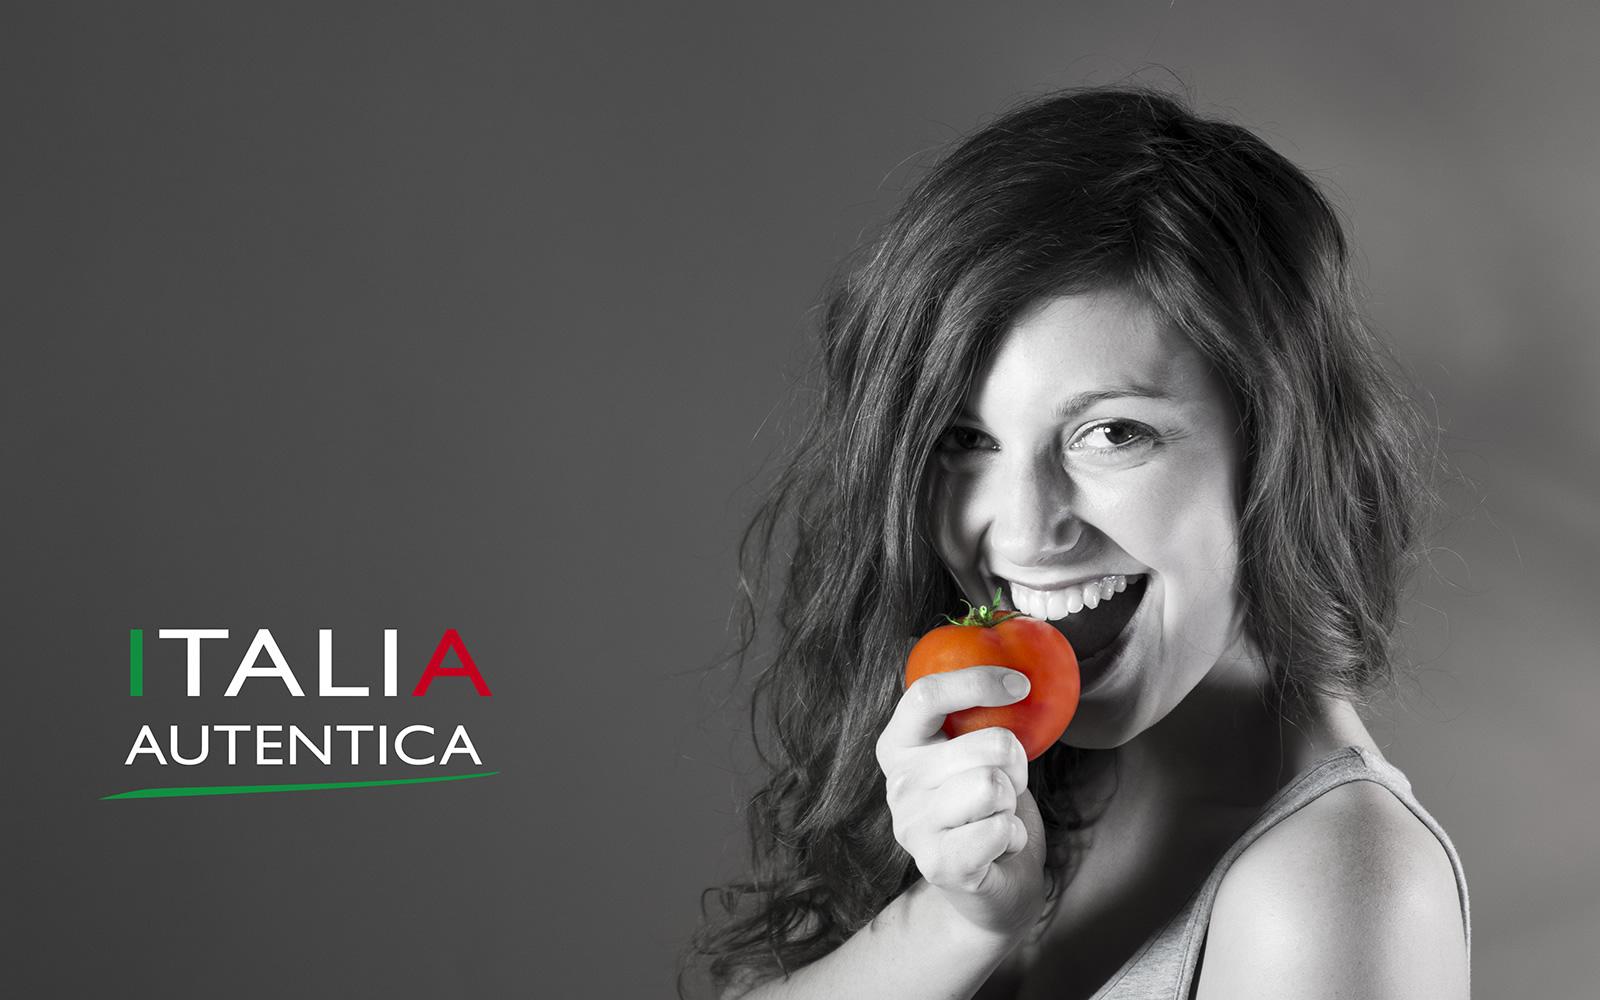 Italia Autentica – Tag 10 secondes